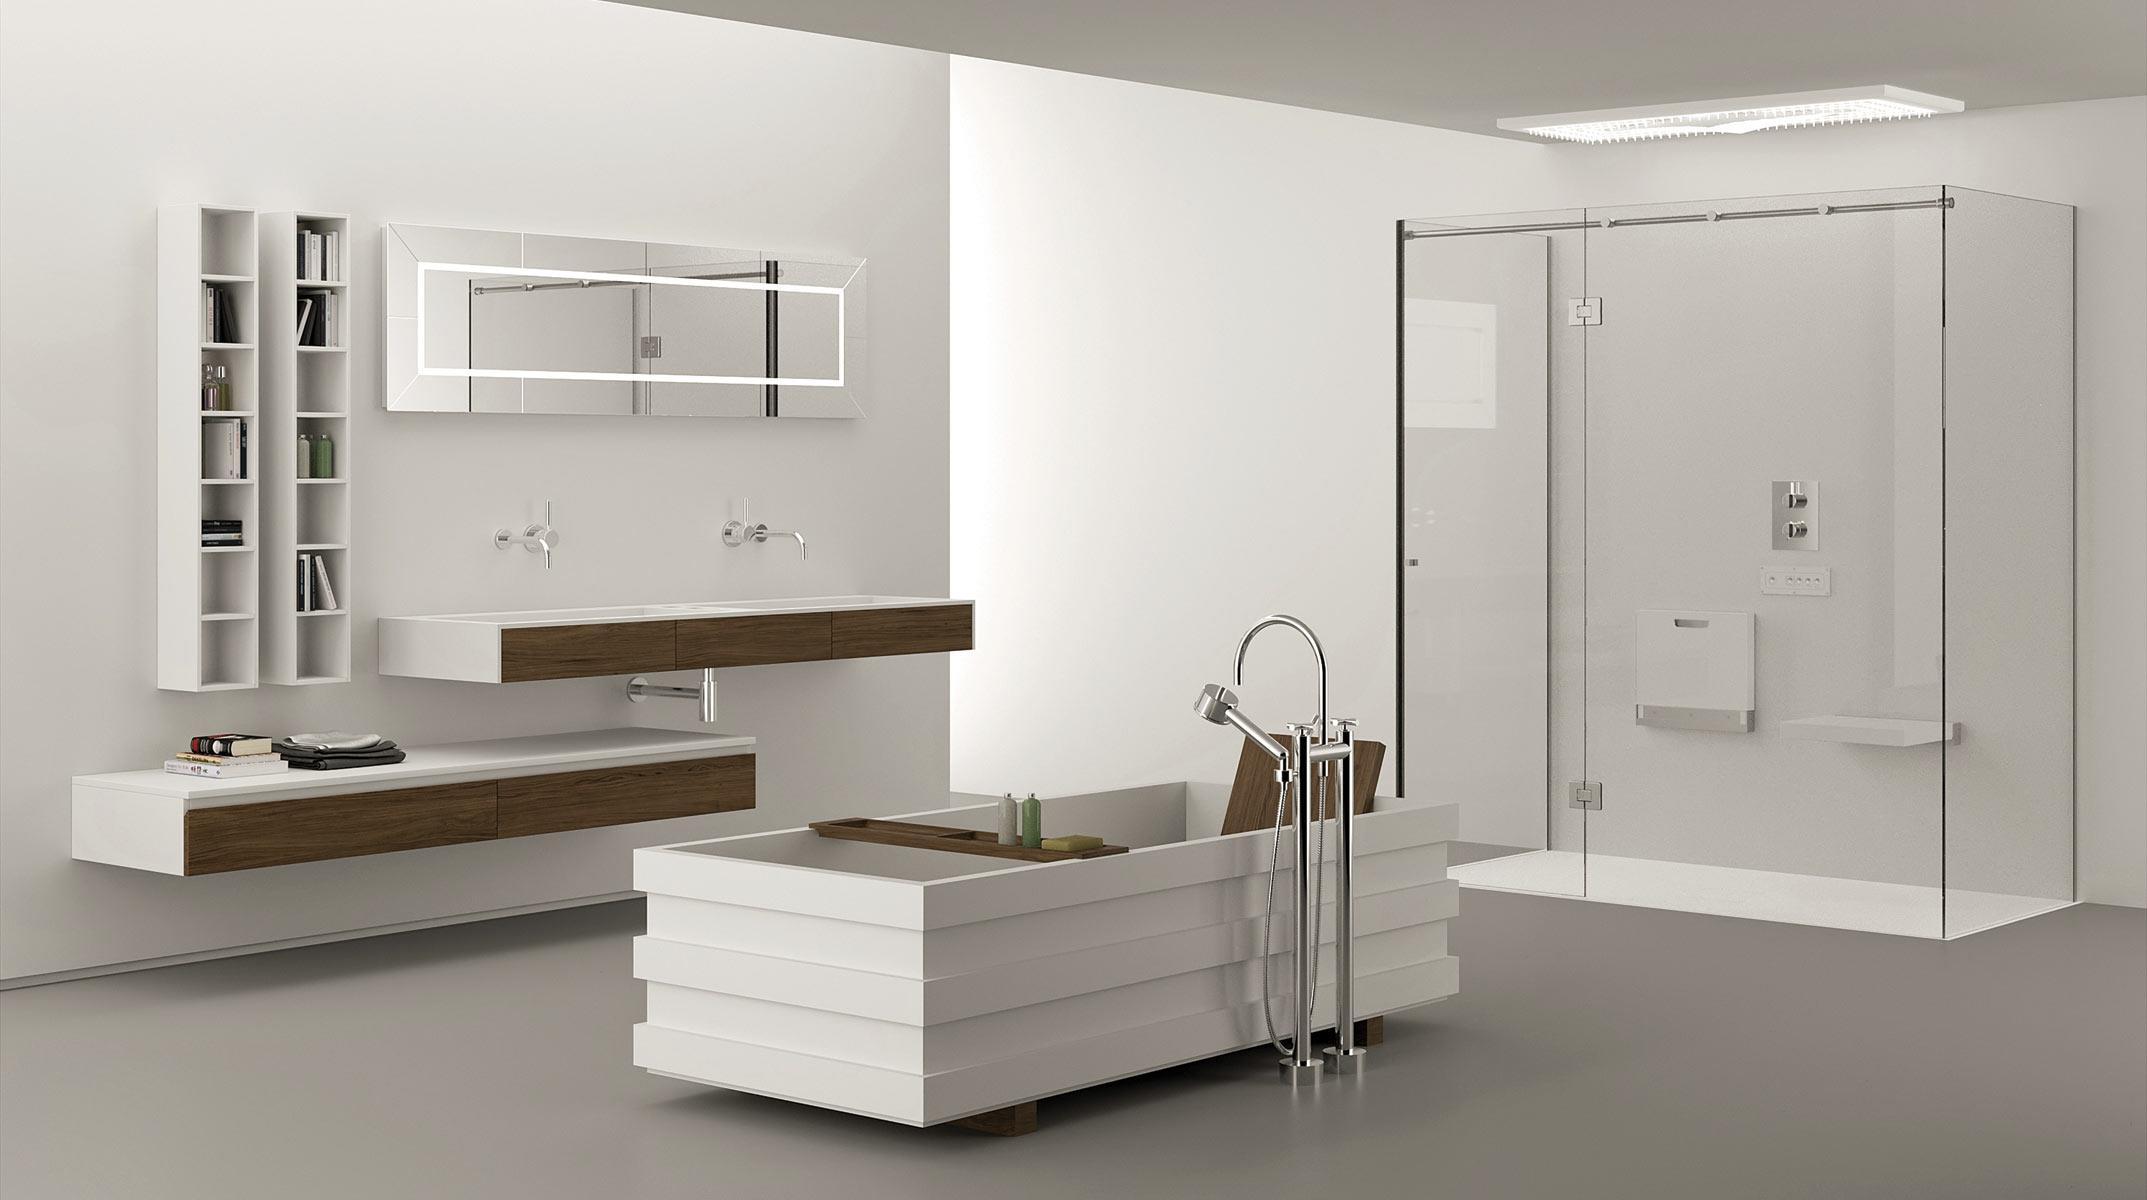 Amenajari bai moderne by momadesign amenajari interioare poze idei inspiratie - Mobile bagno contemporaneo ...